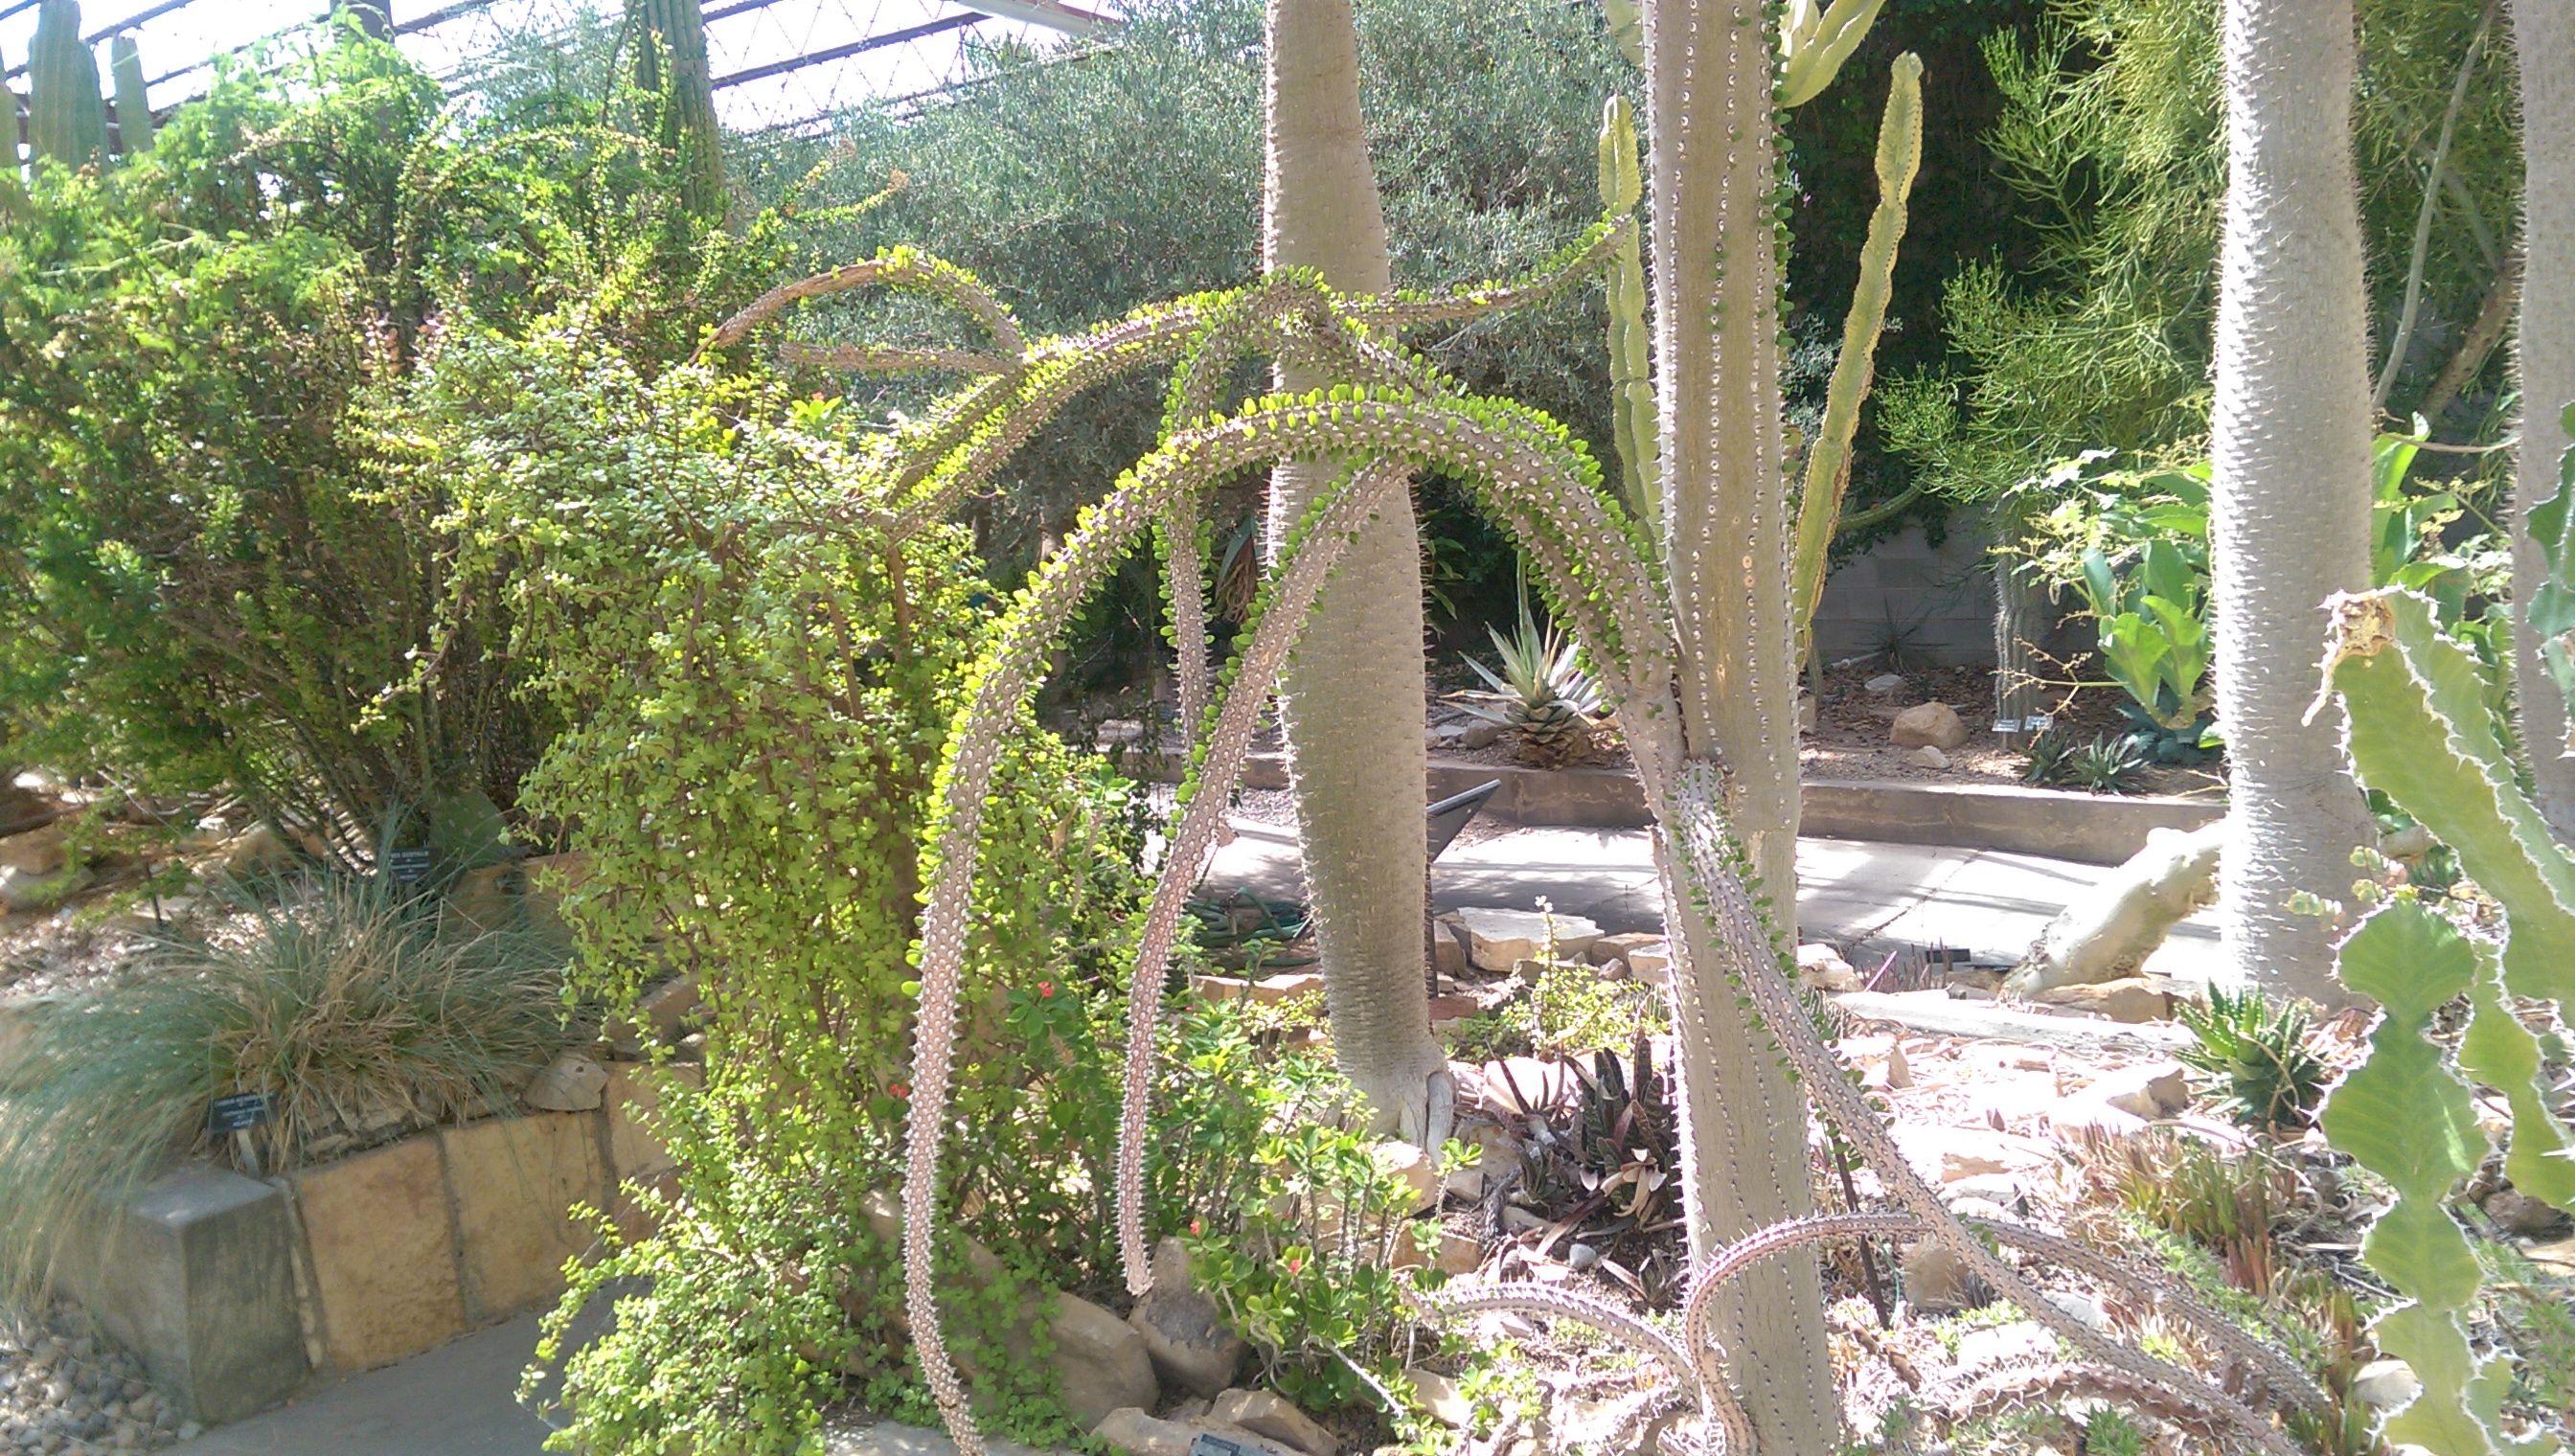 bafa0b6d933da75743c7d5e31bae8fd6 - Living Desert Zoo And Gardens Carlsbad Nm